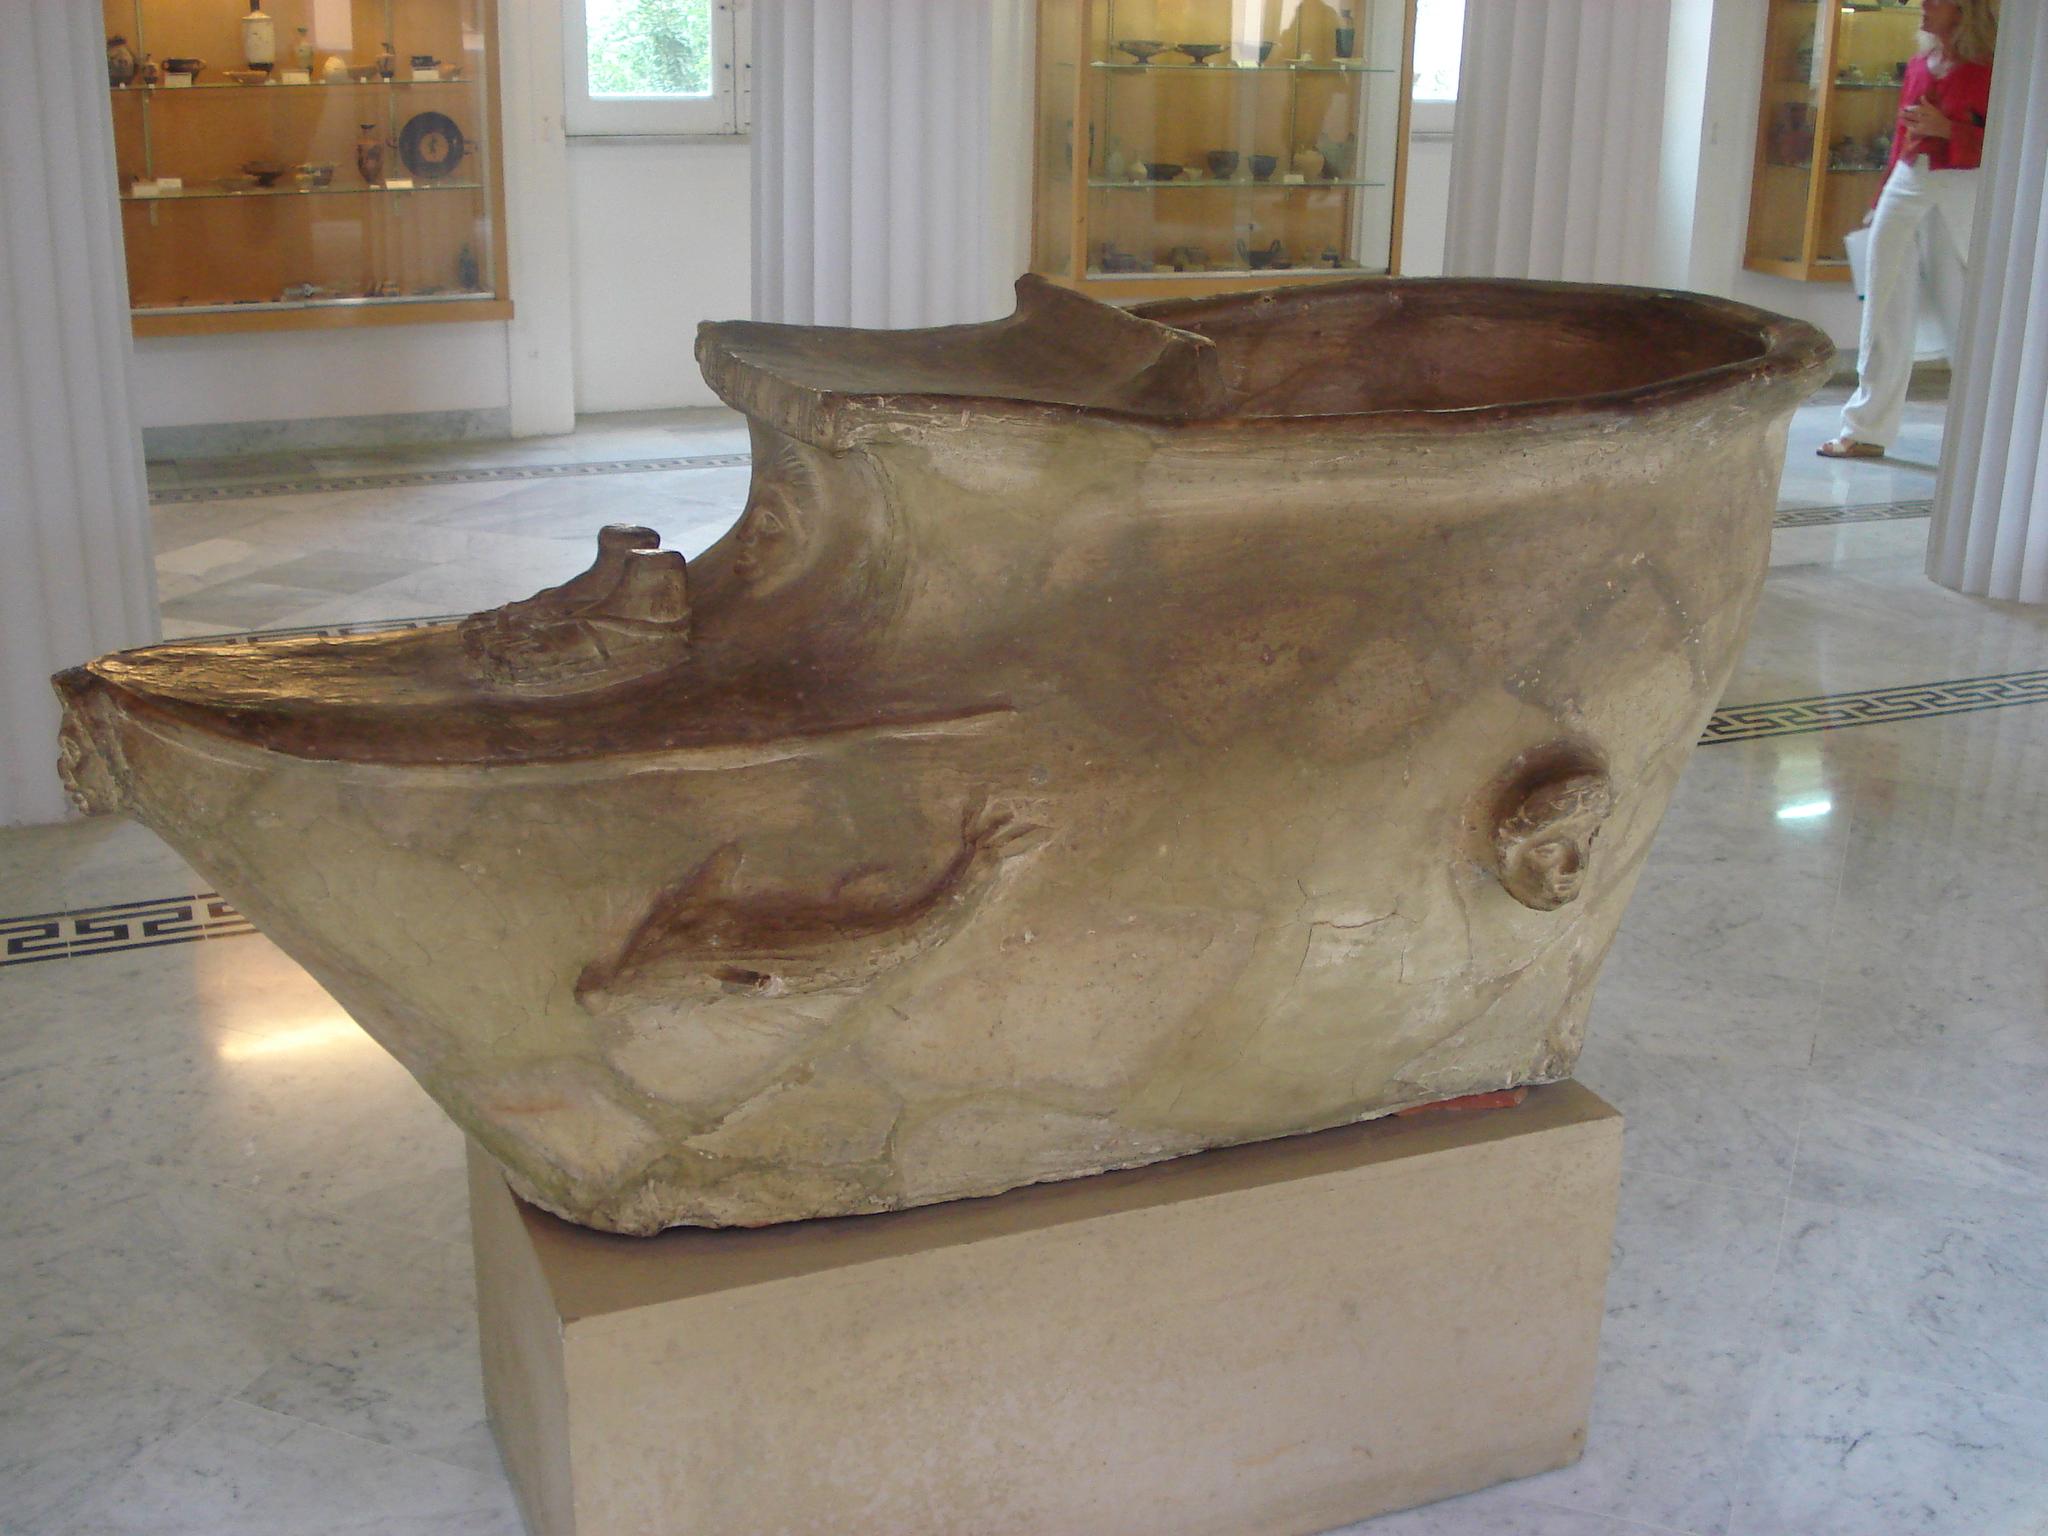 File:Vasca da bagno (sec. V a.C.) da Agrigento 02 - Foto di G. Dall'Orto.jpg - Wikimedia Commons